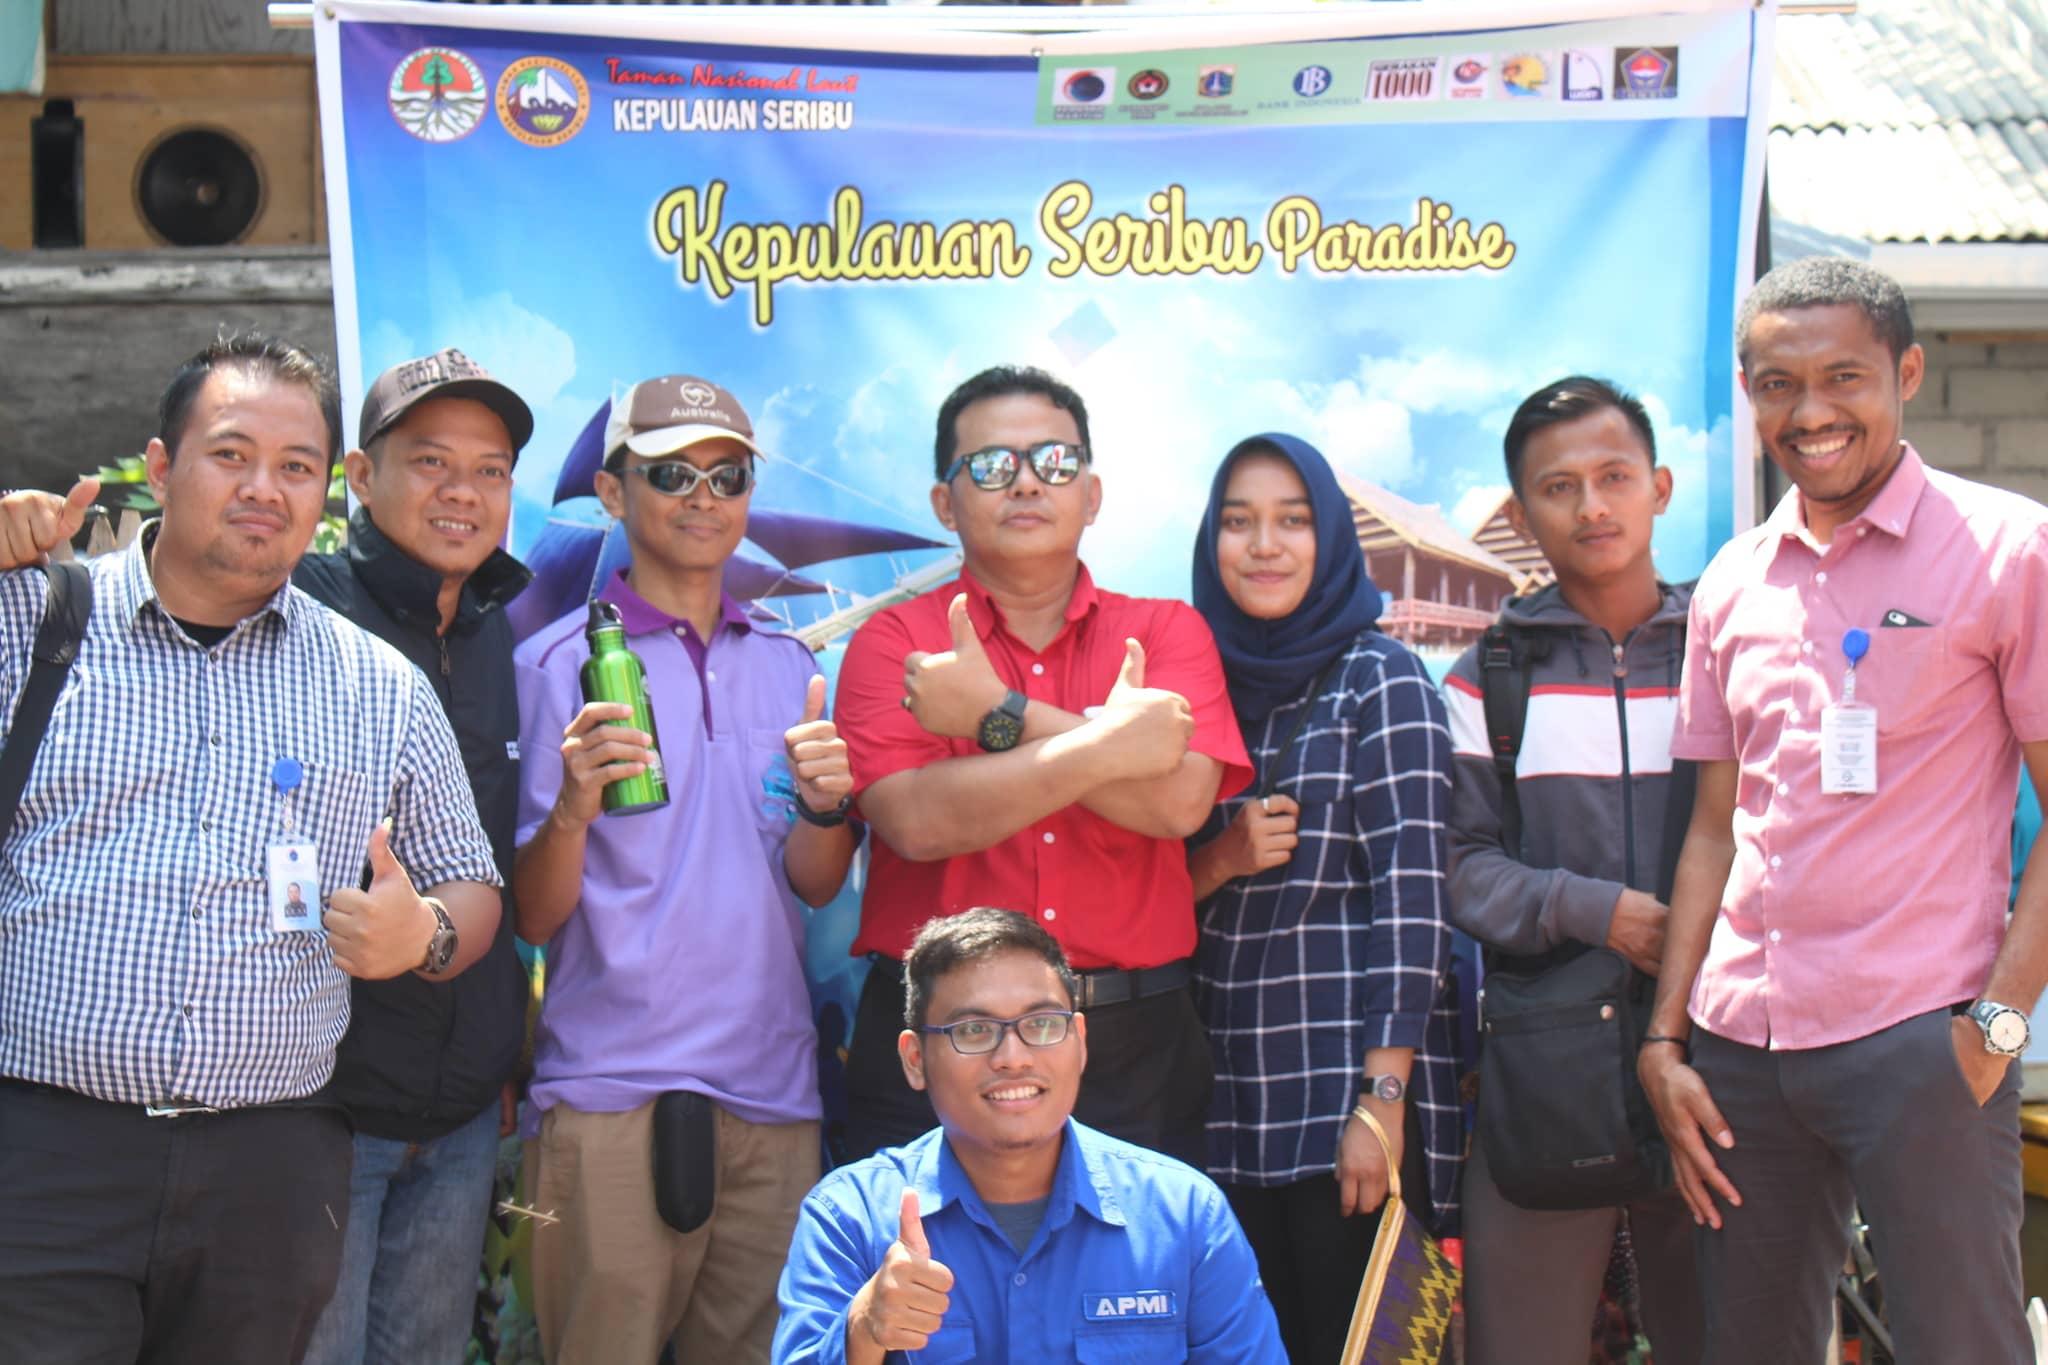 Dialog Pengembangan Budaya Maritim Mendukung KSPN Pulau Seribu dan Pesta Syukuran Laut di Pulau Harapan dan Pulau Kelapa Dua, Kepulauan Seribu.